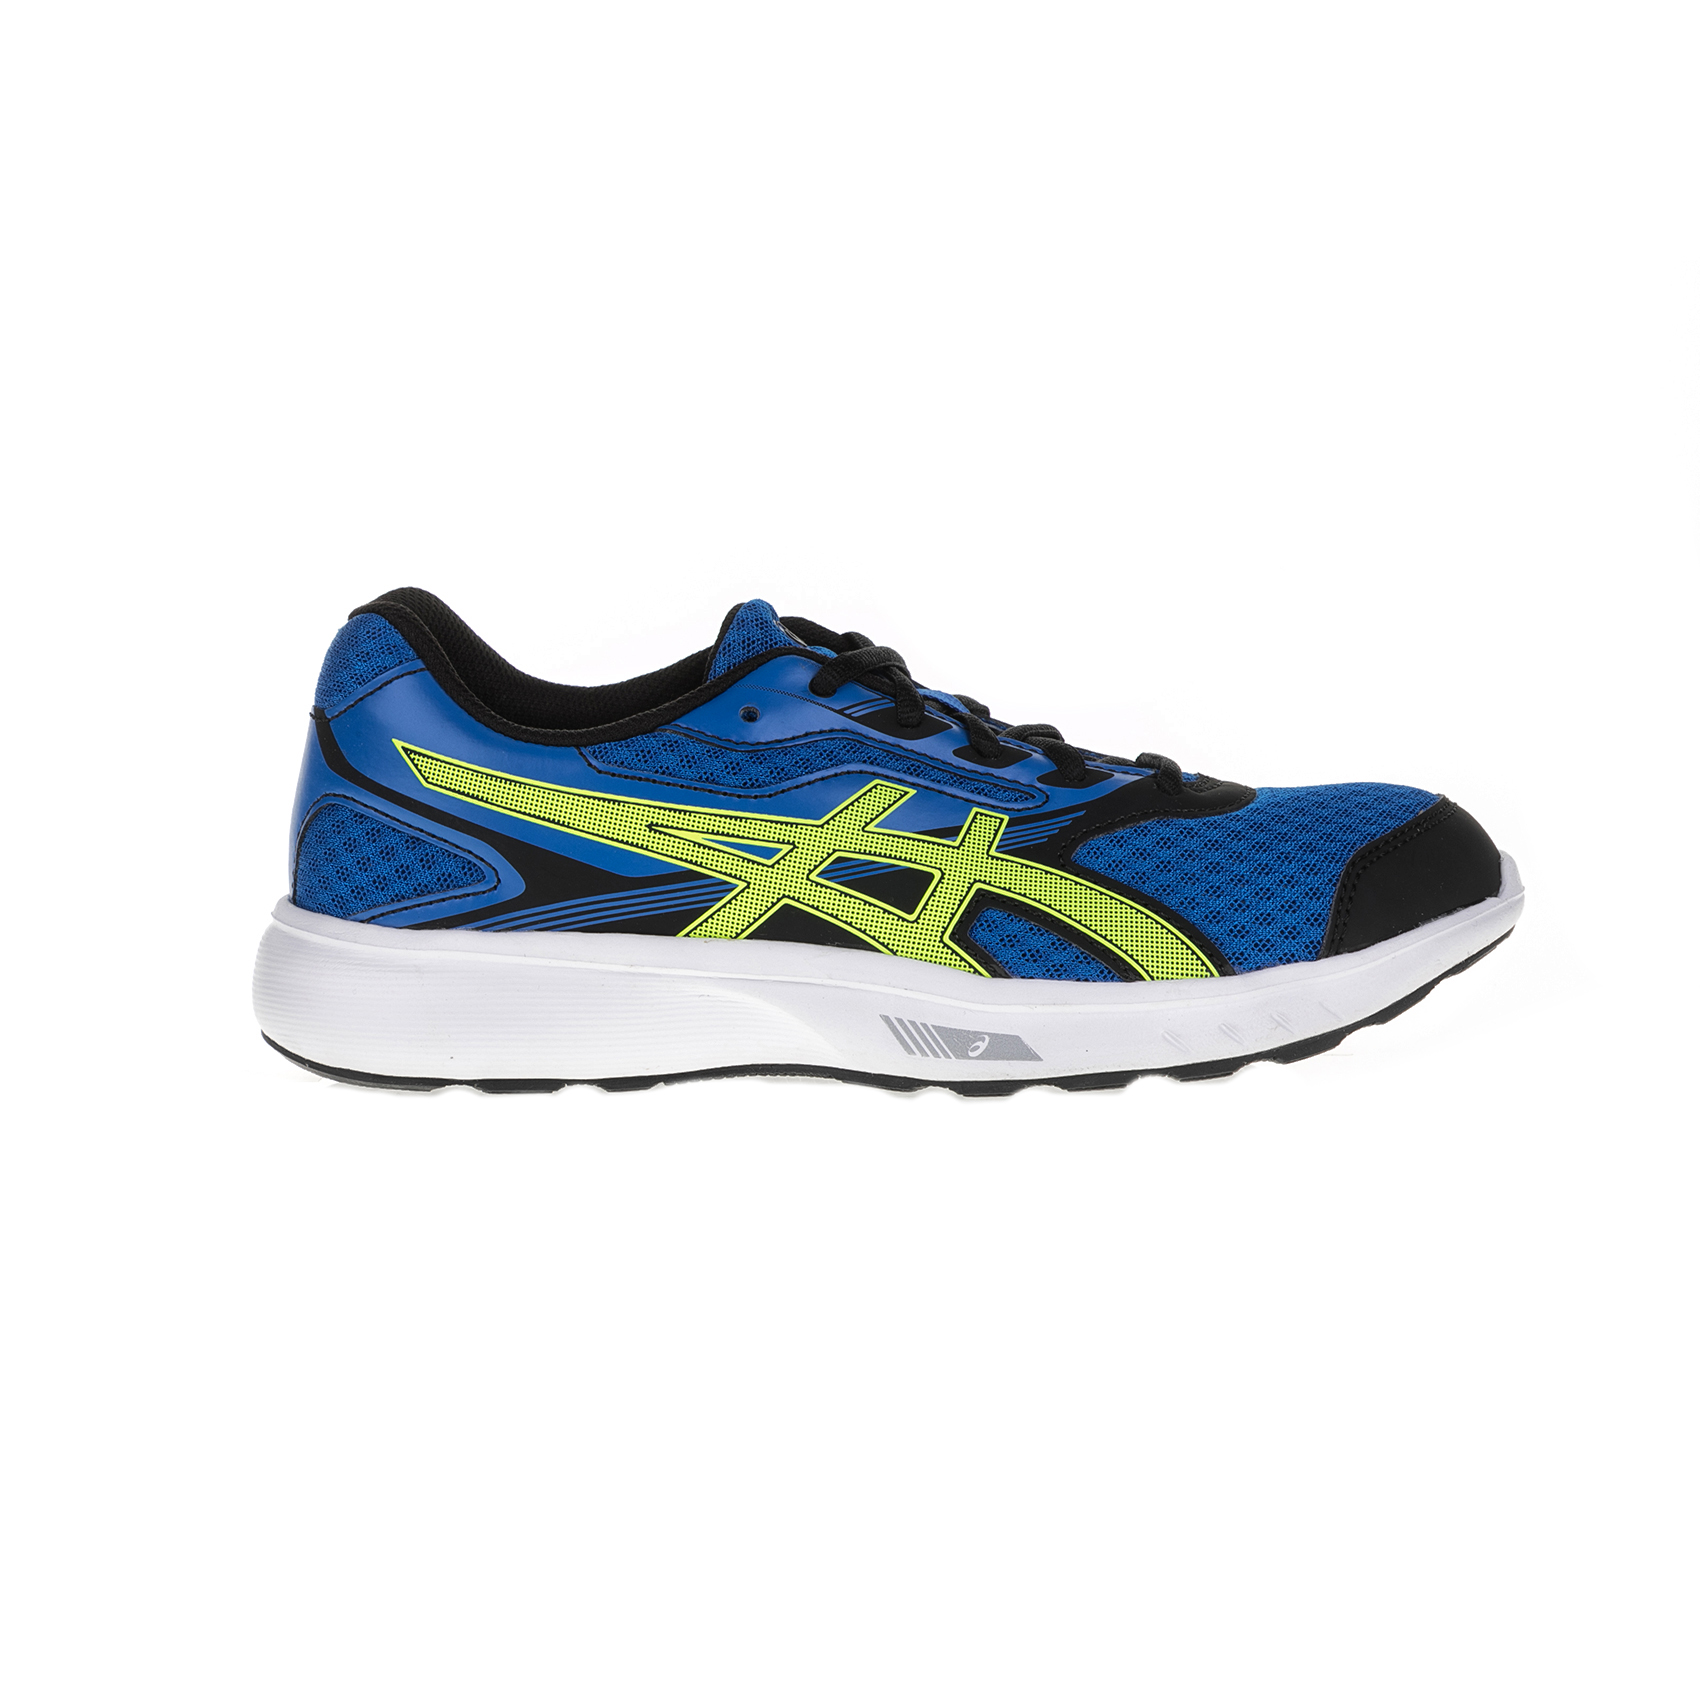 ASICS – Παιδικά αθλητικά παπούτσια ASICS STORMER GS μπλε